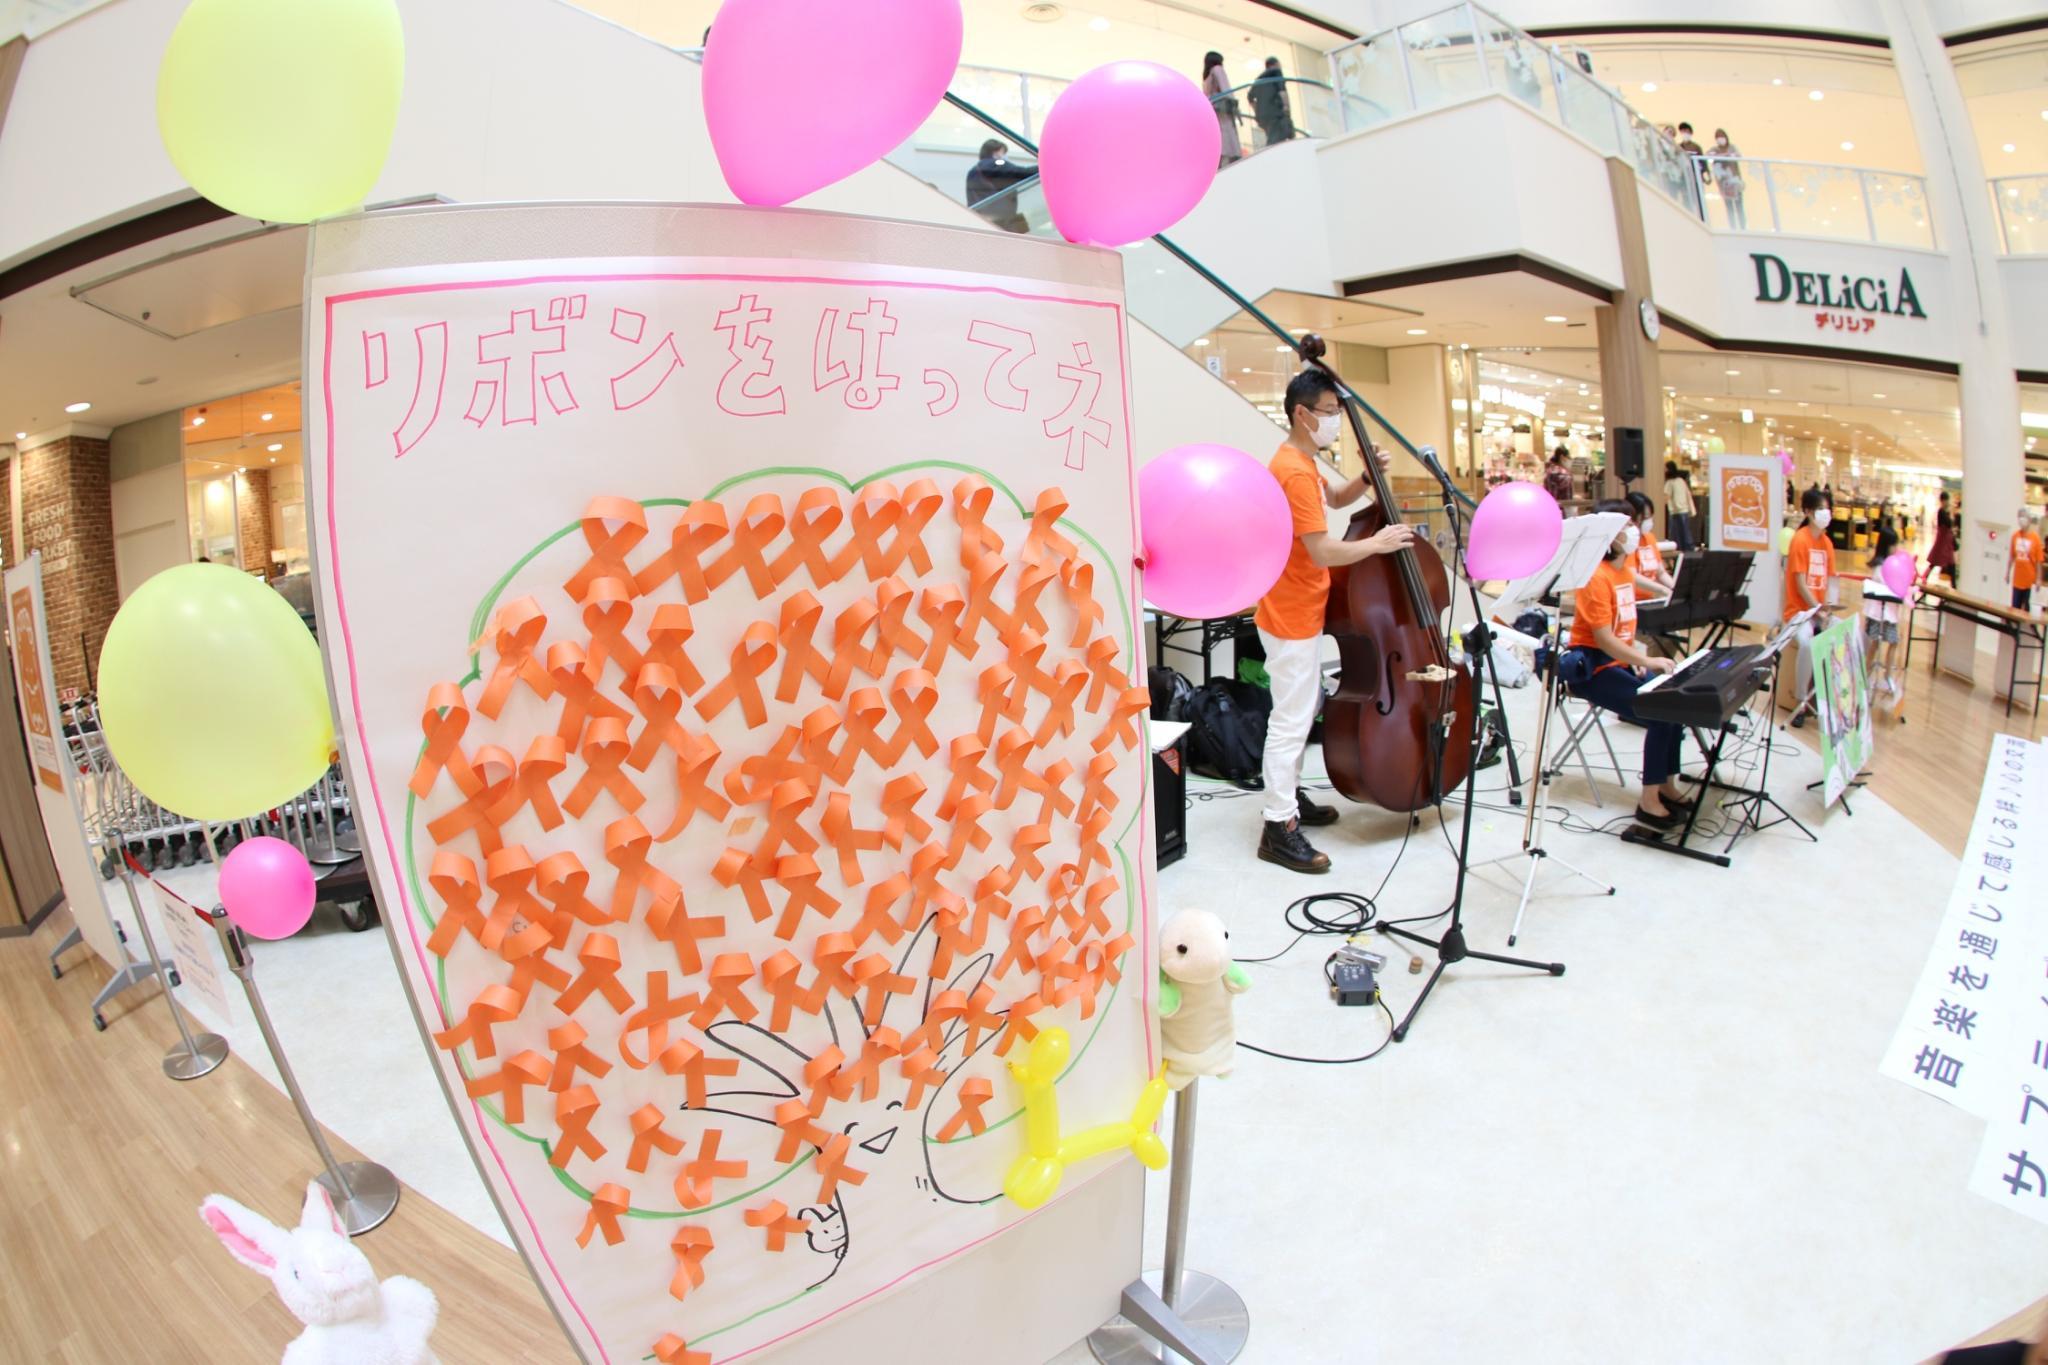 http://www.orangeribbon.jp/info/organization/35e9ae2ca7093ec2b988d57c6191d87569326cc2.jpg